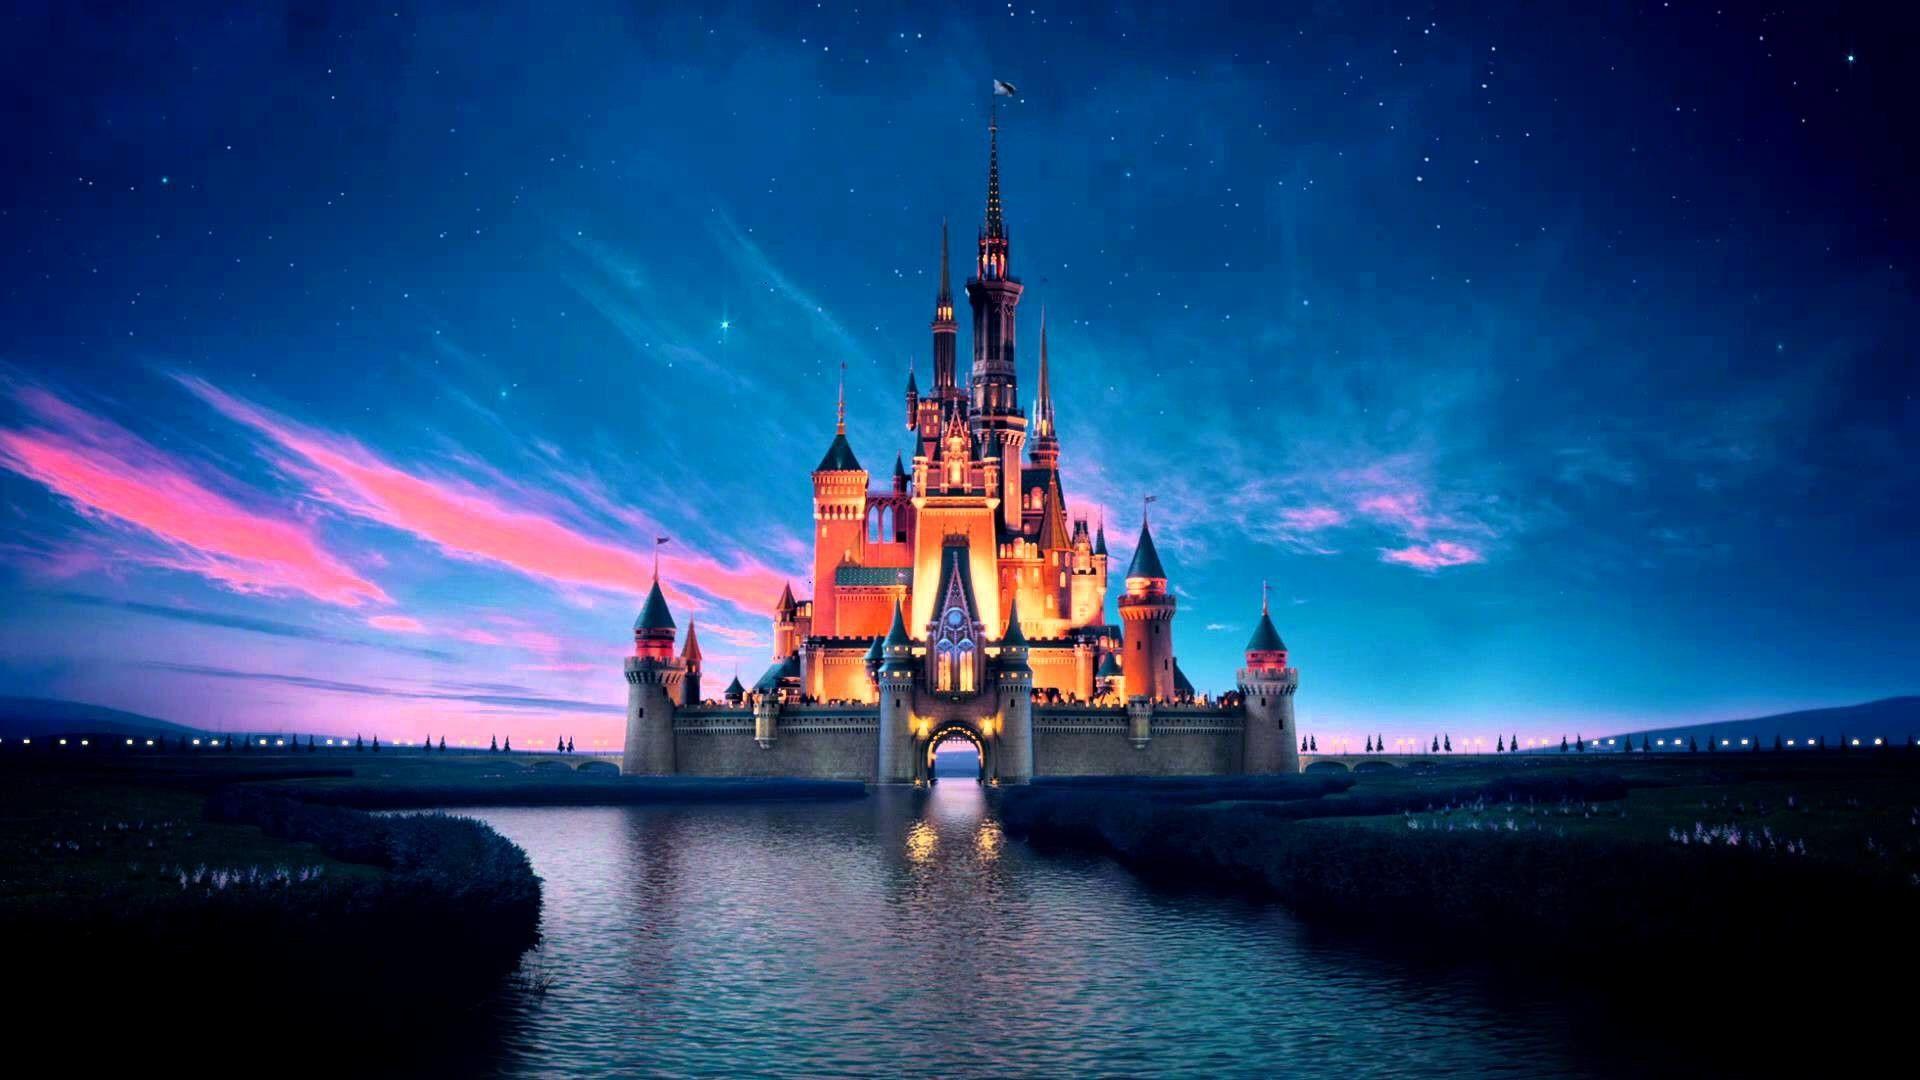 Disney Castle Wallpapers Top Free Disney Castle